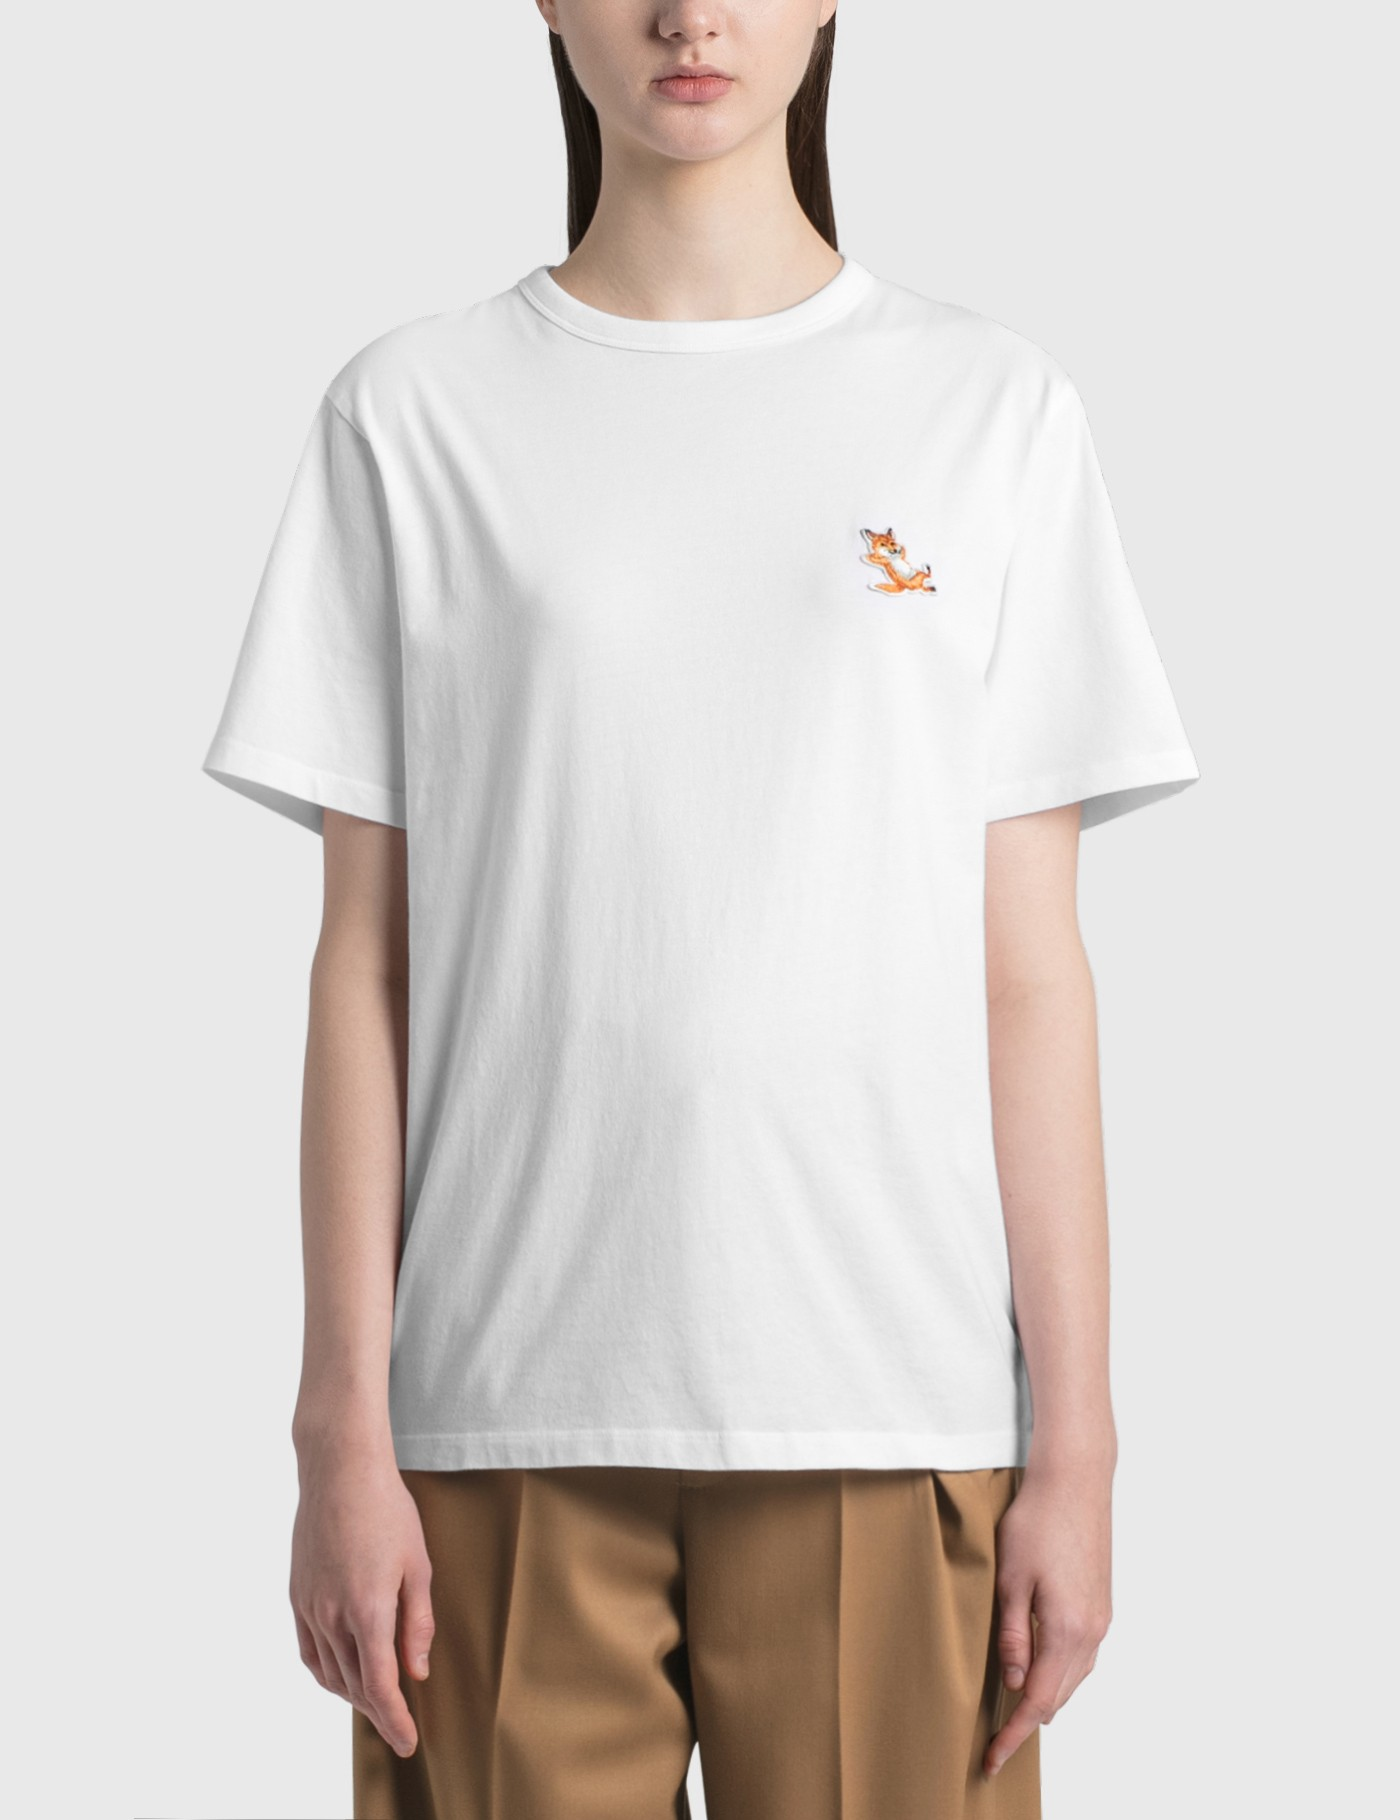 Maison Kitsuné CHILLAX FOX PATCH CLASSIC T-SHIRT